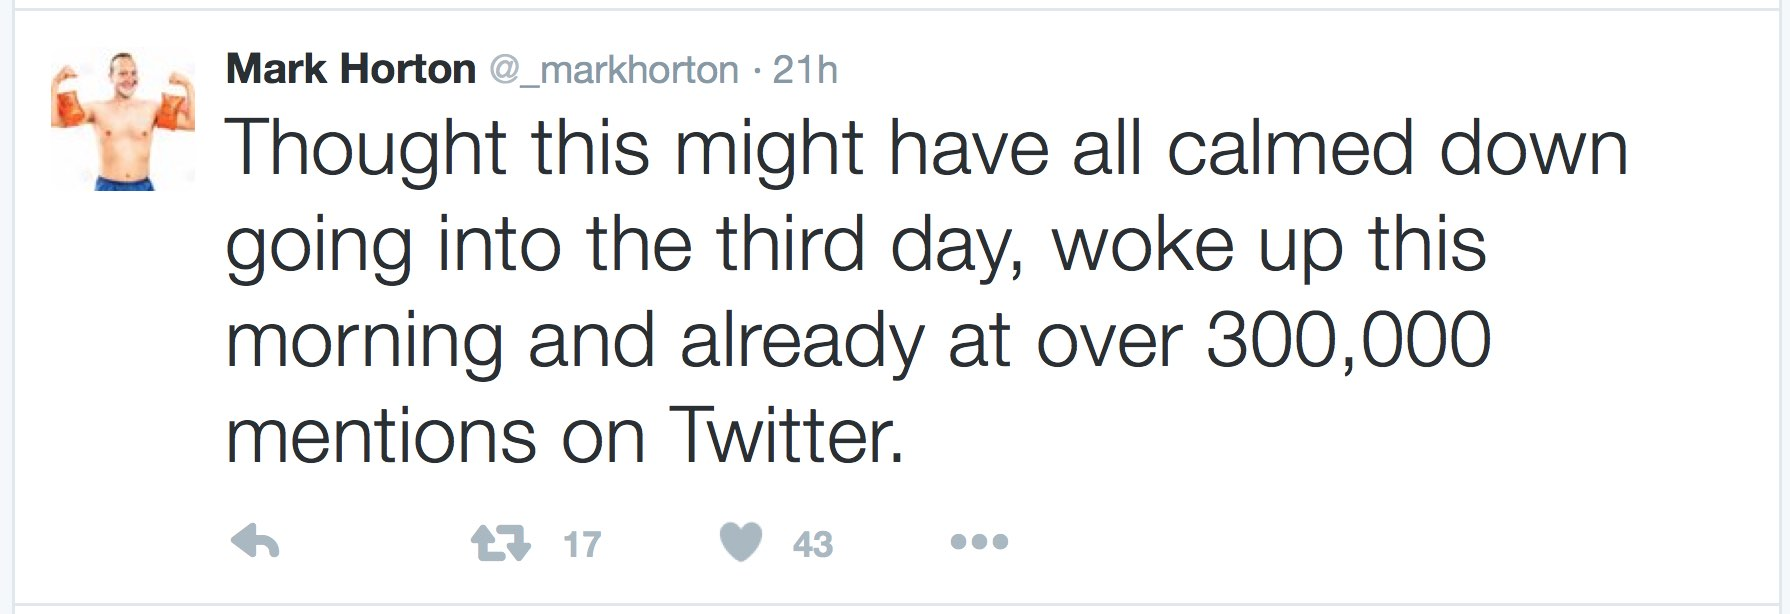 markhorton2